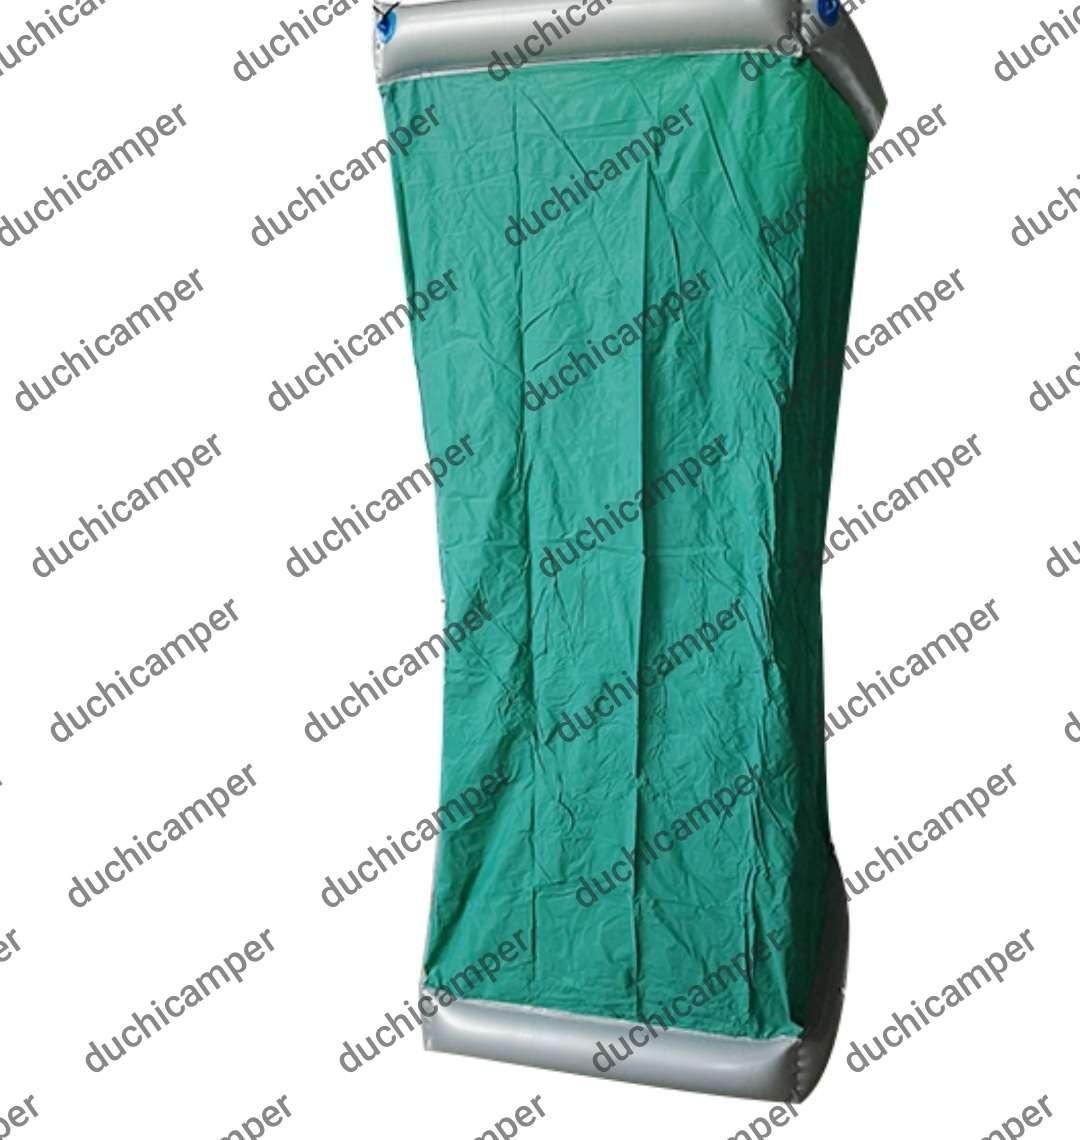 Imagen producto Duchicamper - ducha + WC + cambiador + probador en PVC reforzado e inflable 3